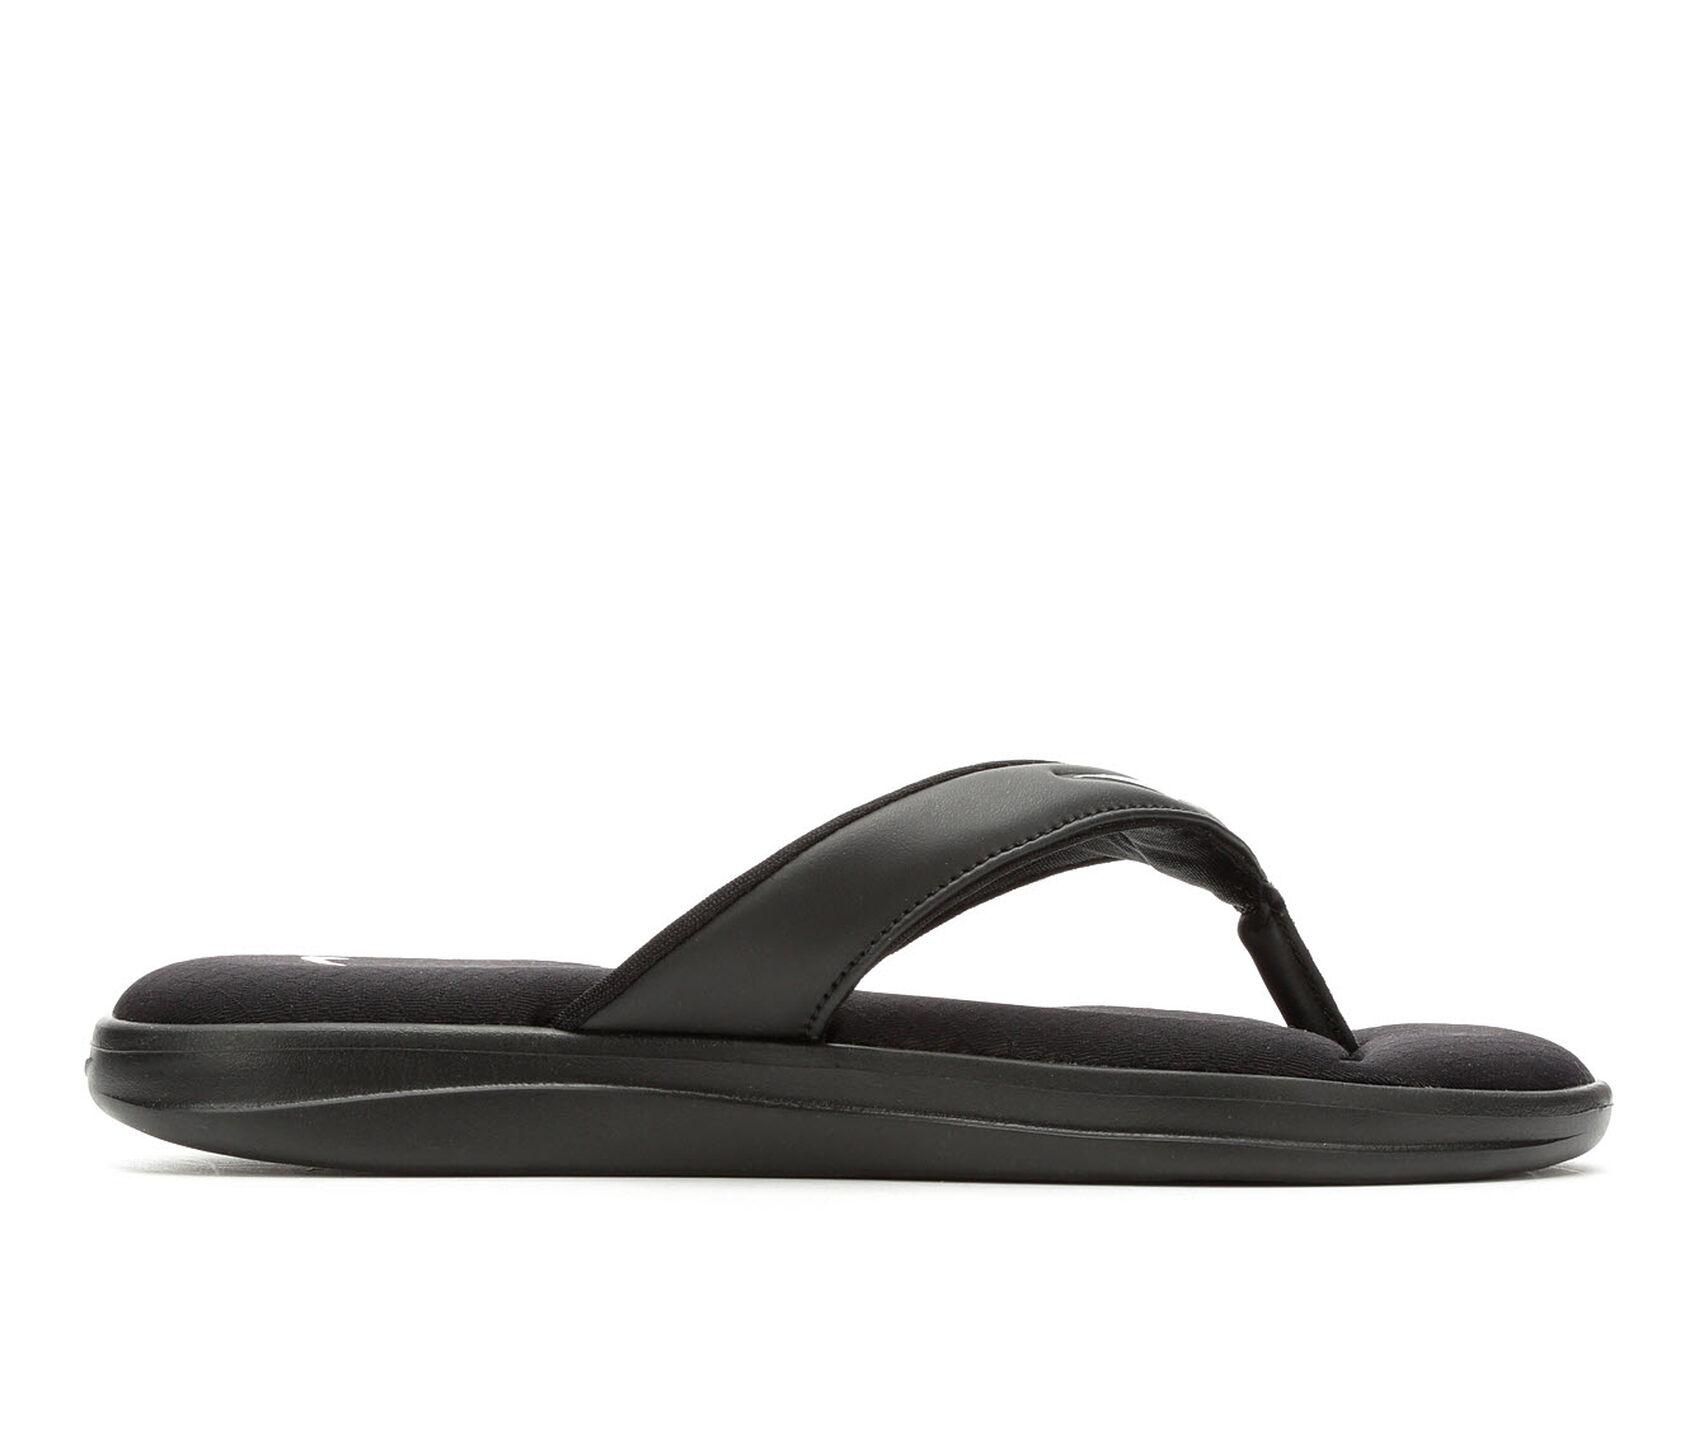 Womens Nike Ulta Comfort Thng 3 Sport Sandals  Shoe Carnival-8653